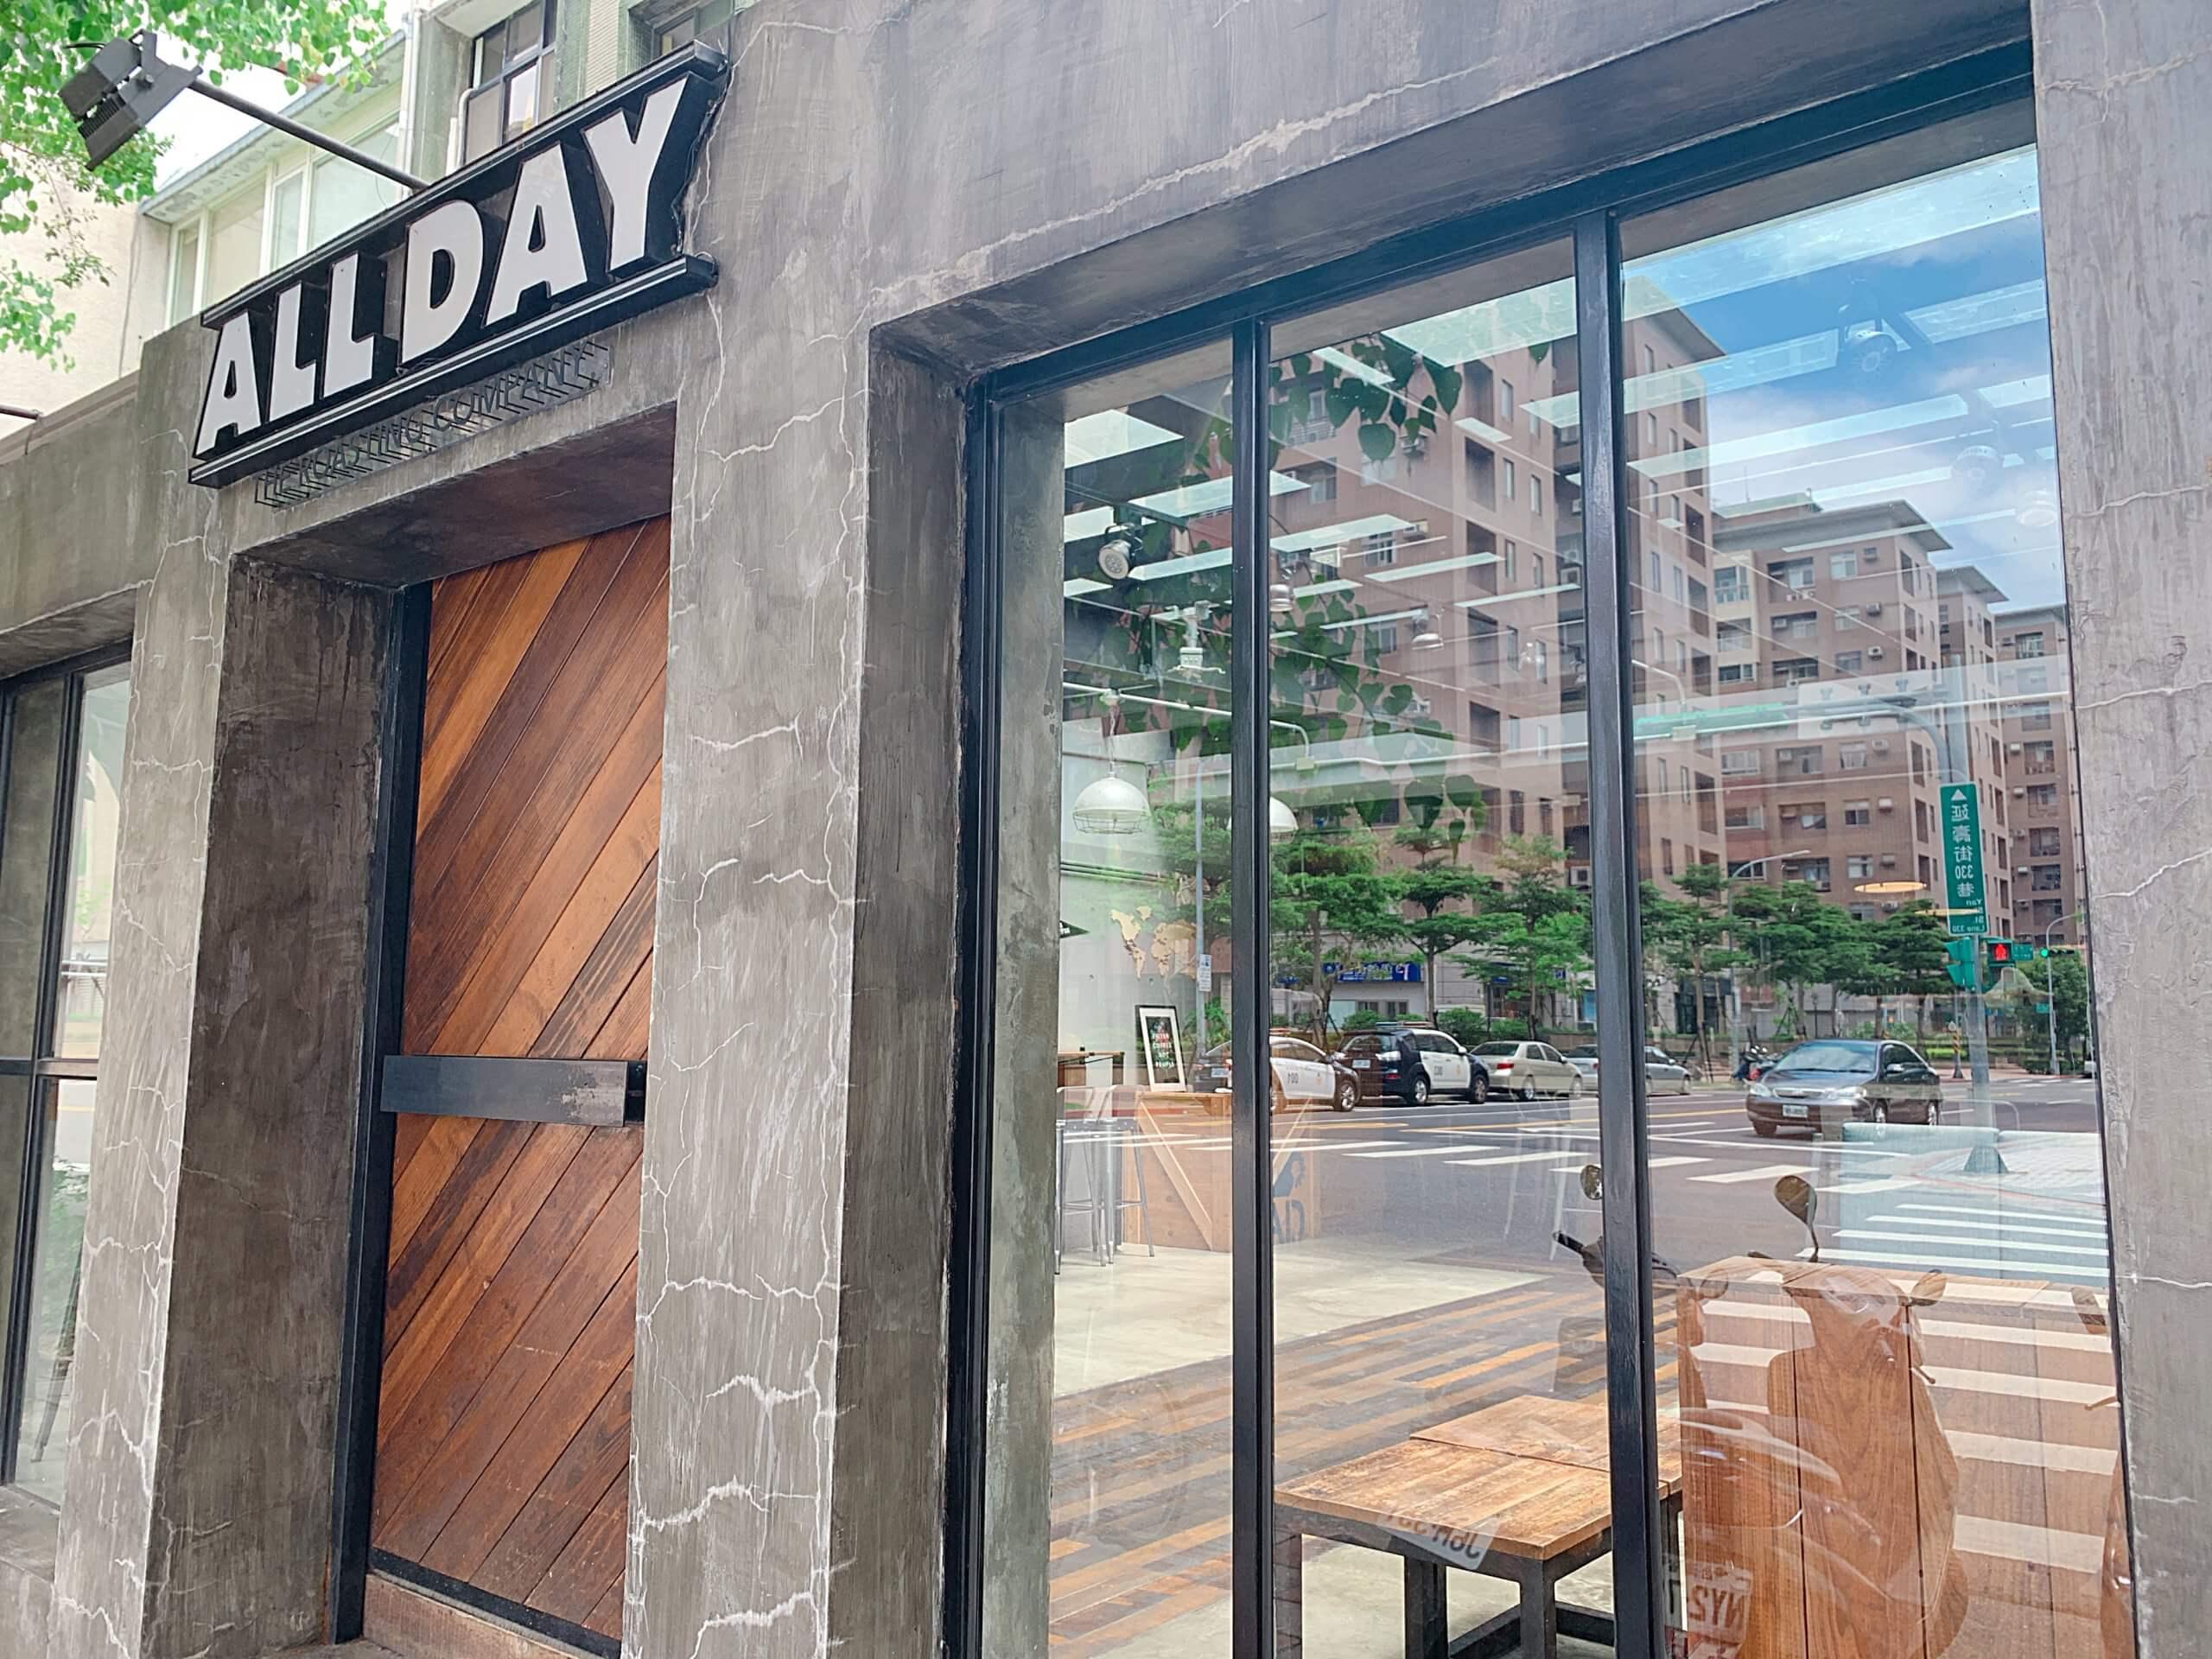 【食記】民生社區|All Day Roasting Company—工業質感咖啡廳